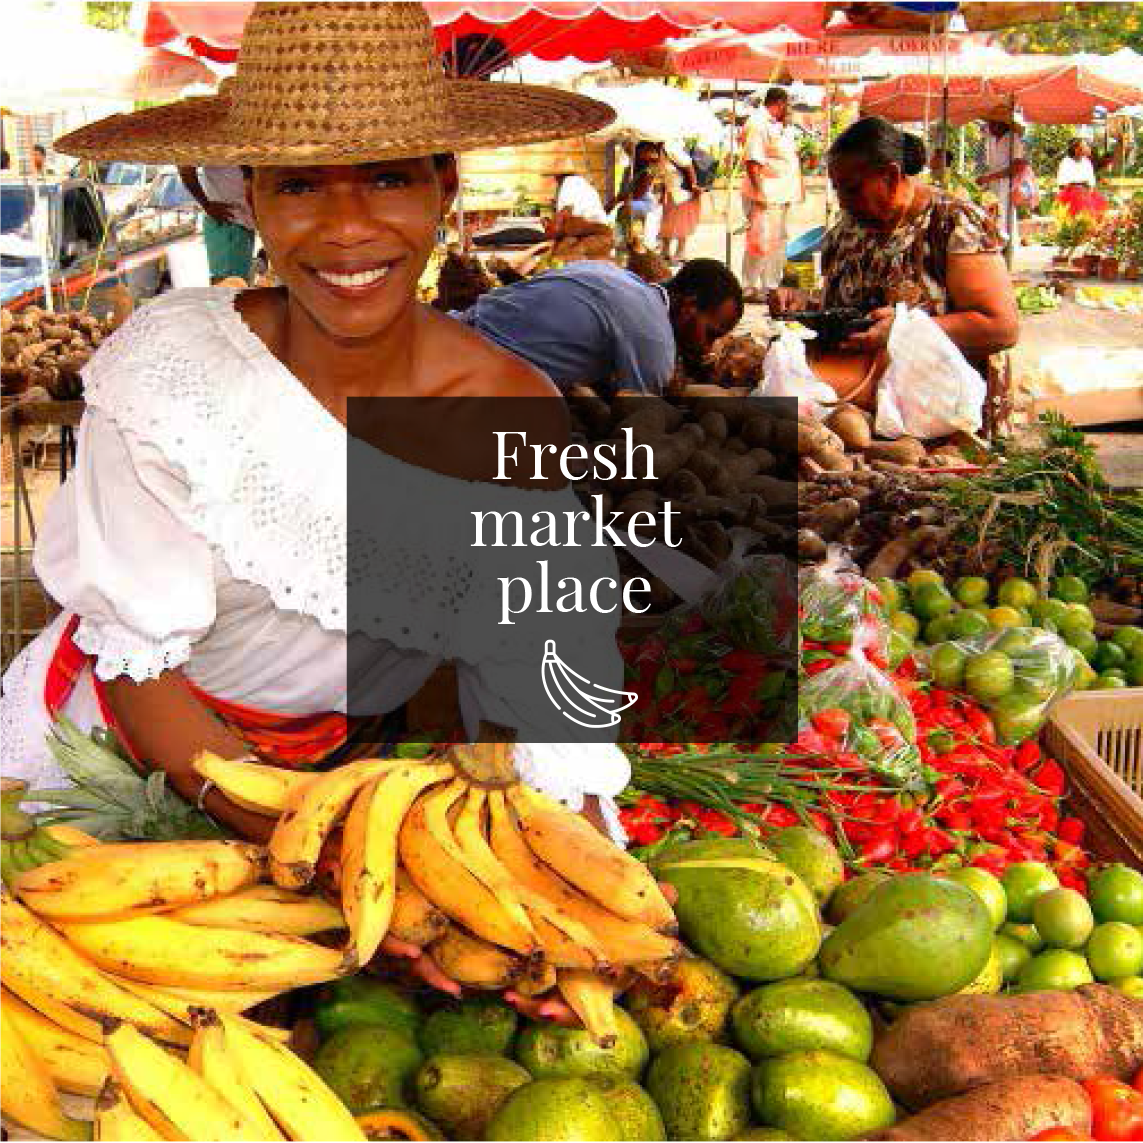 Fresh market place